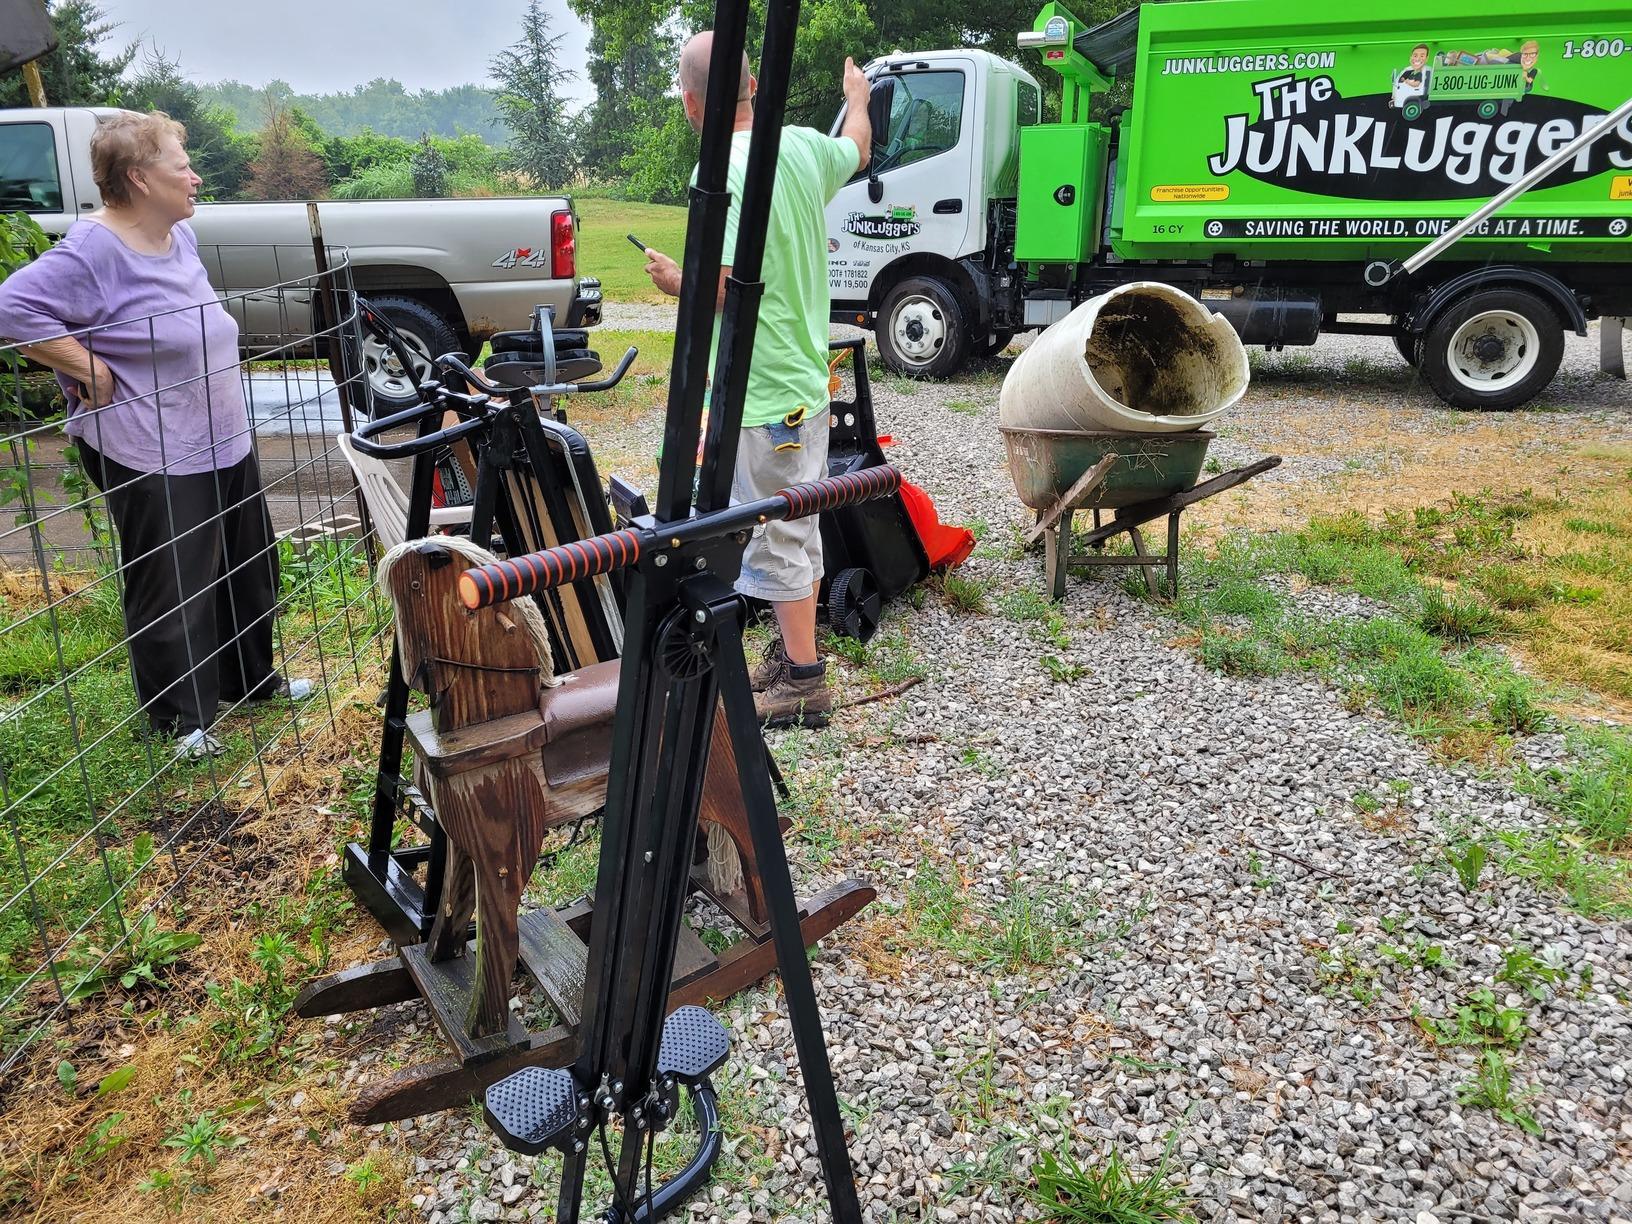 Exercise Equipment Removal in Olathe, KS